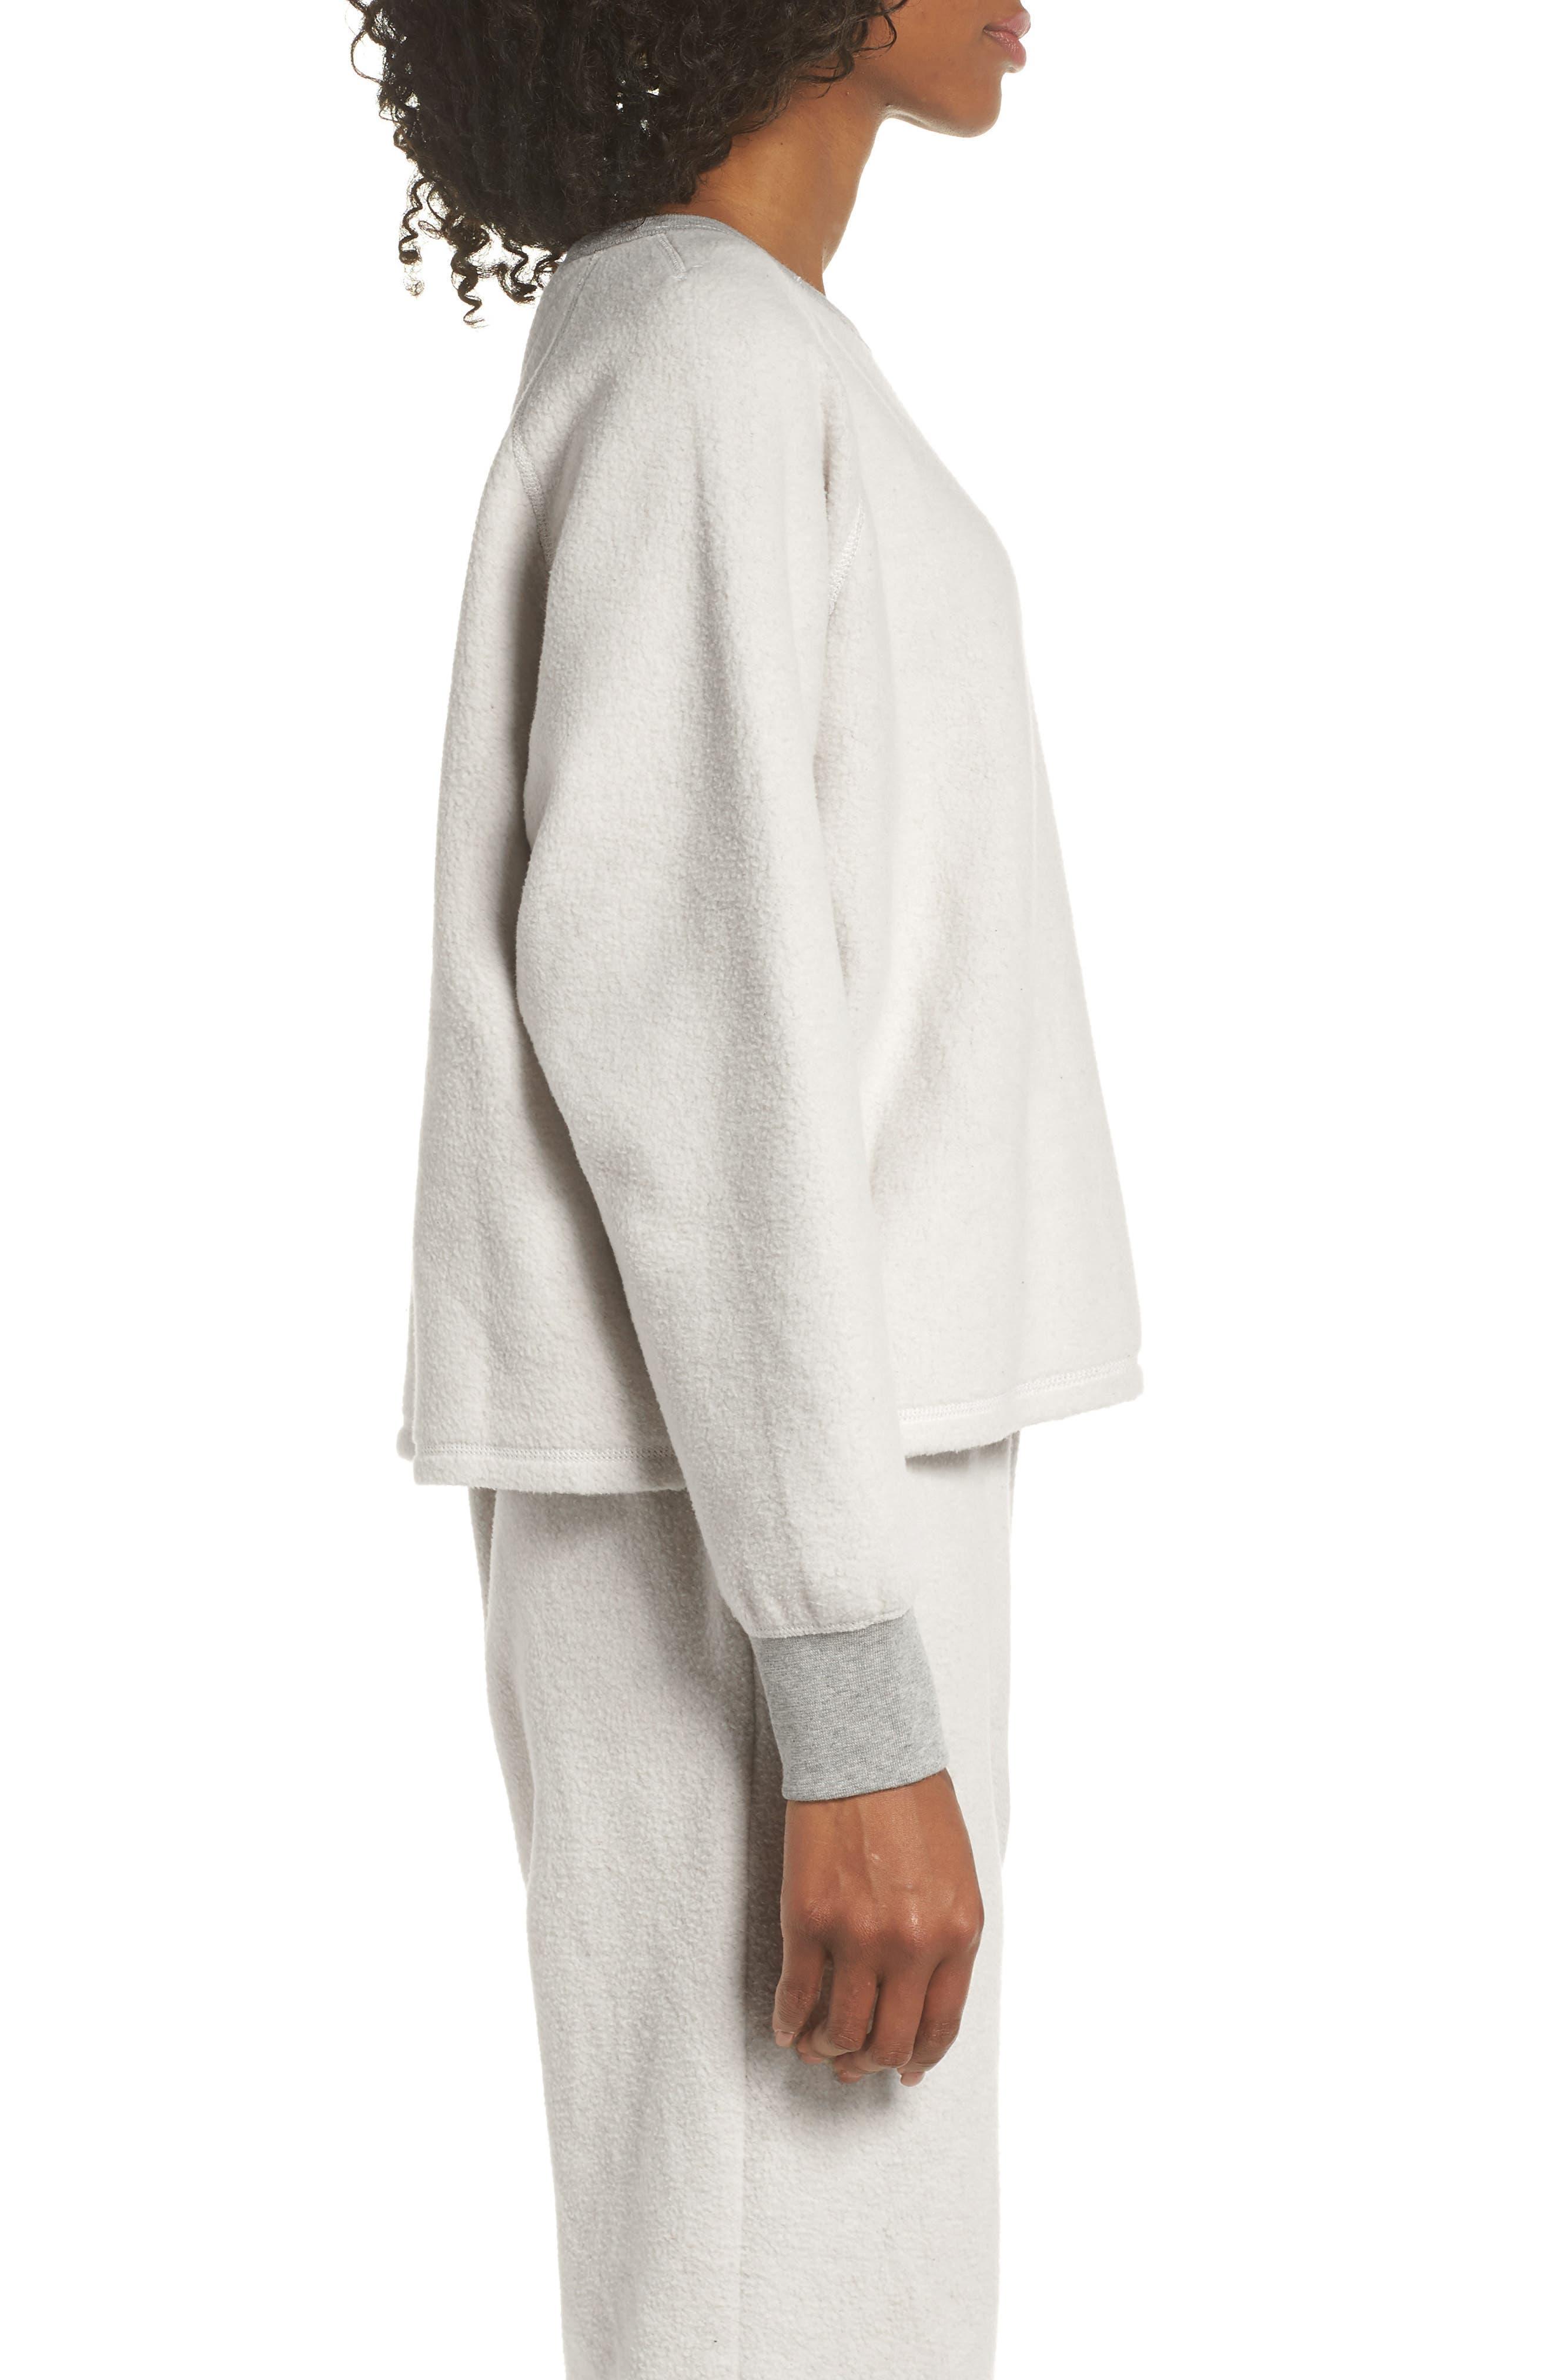 MADEWELL, Fleece Pajama Sweatshirt, Alternate thumbnail 3, color, 020